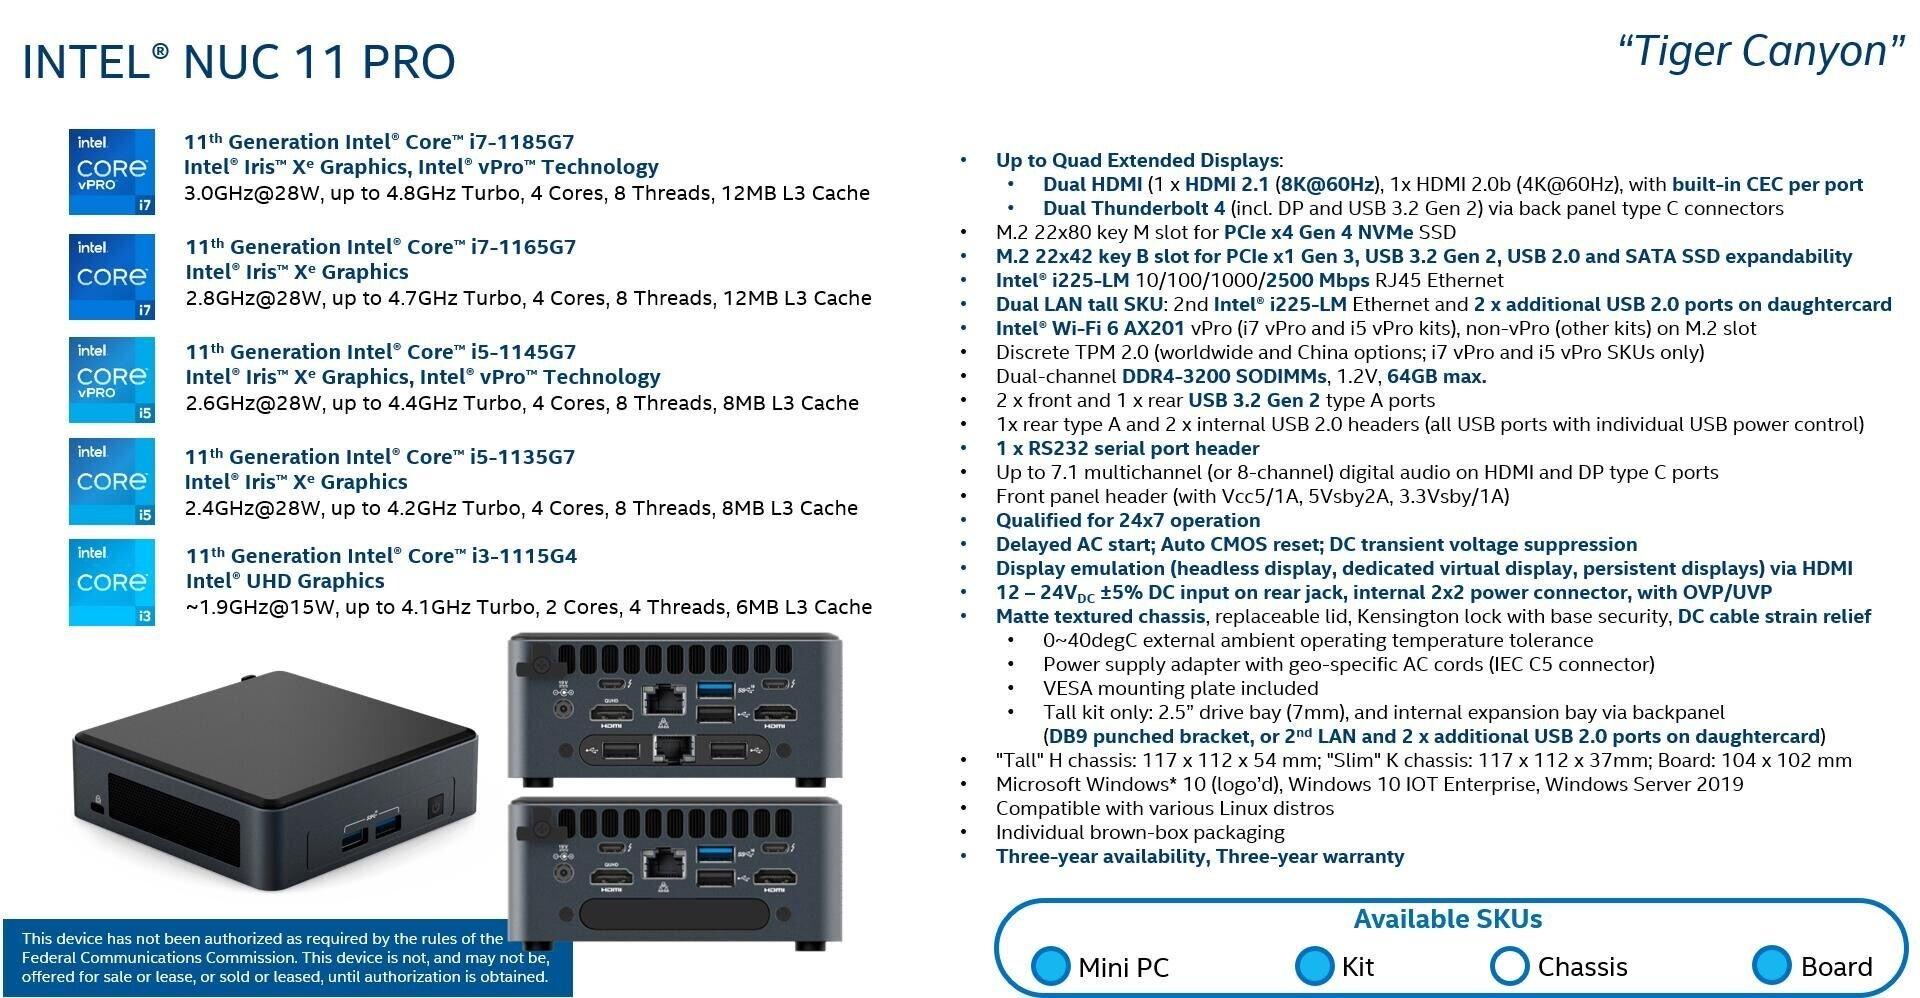 Intel NUC11 Pro Tiger Canyon